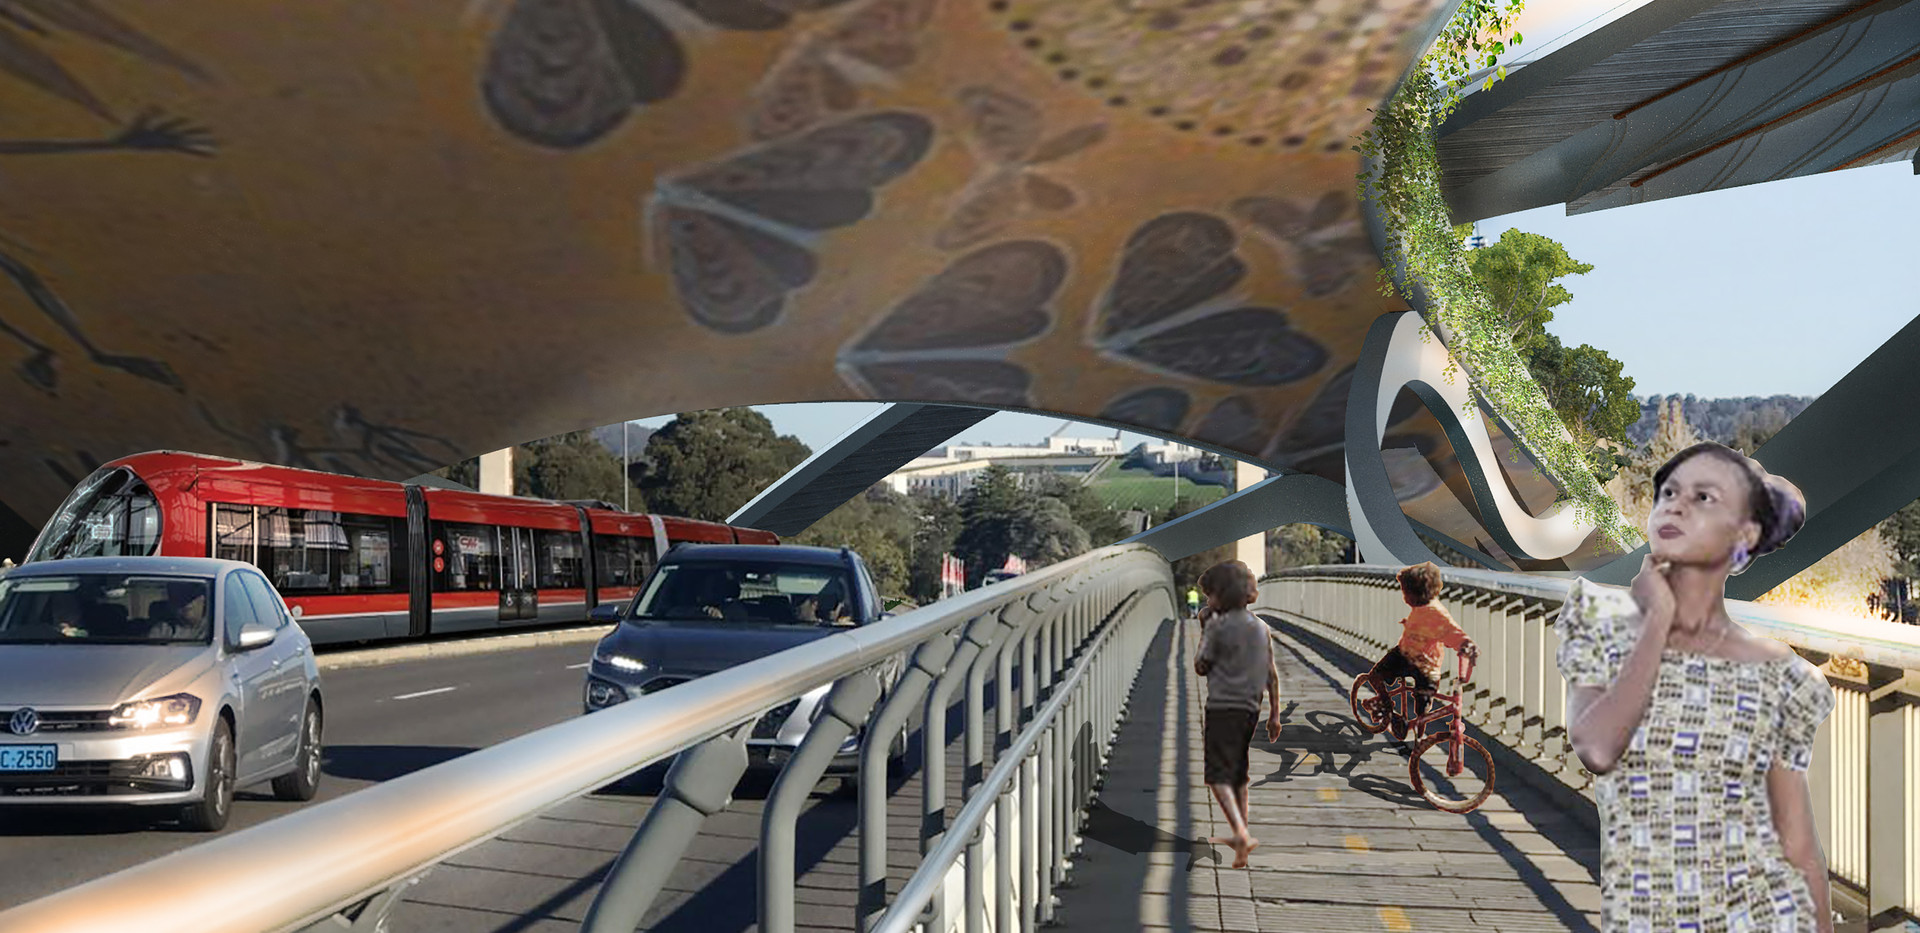 Aboriginal Art Projection